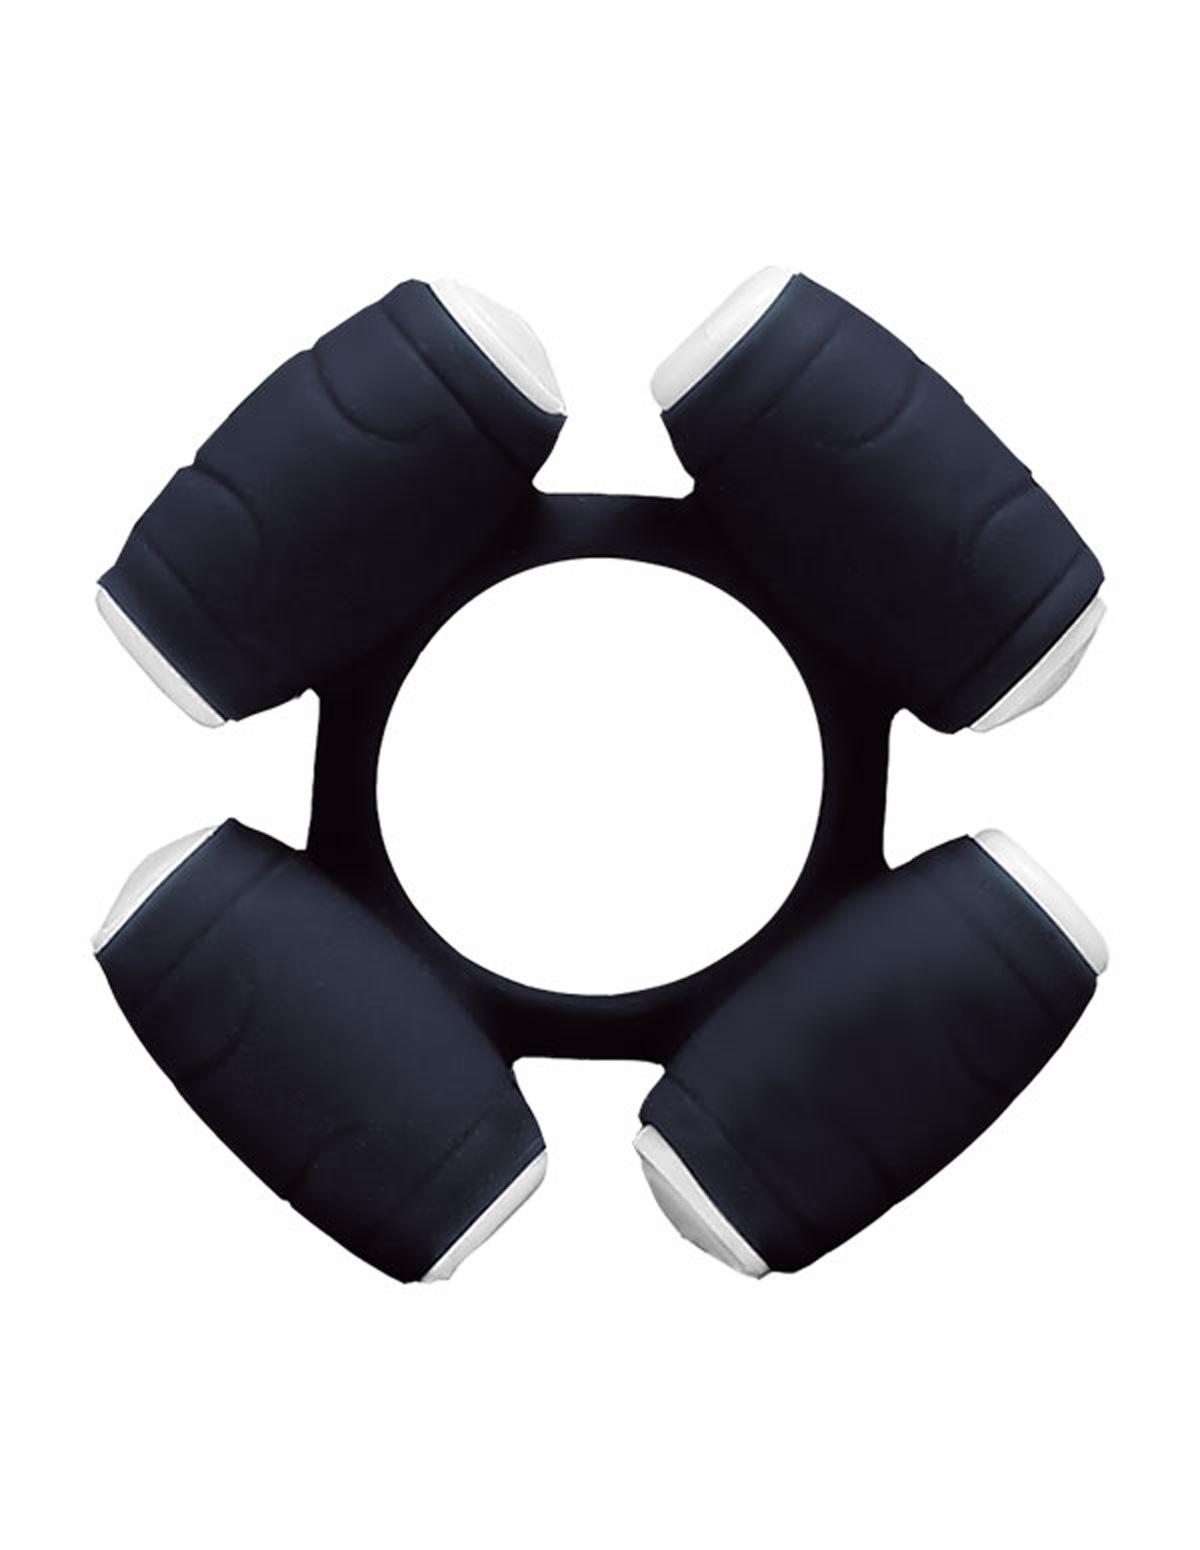 Vedo Turbo Vibrating Ring